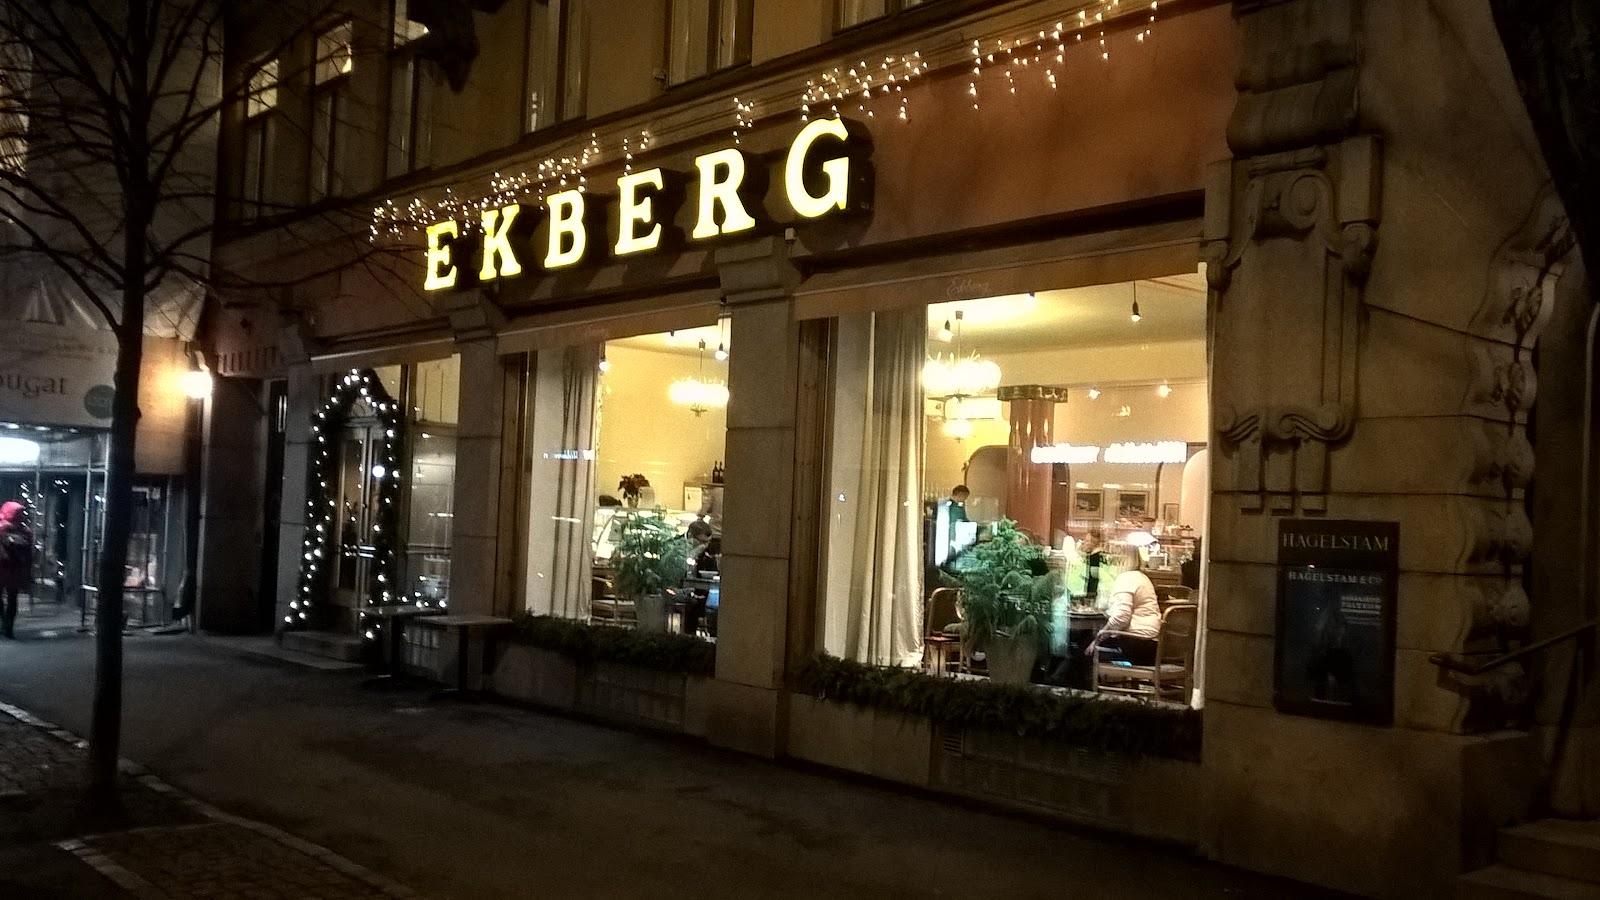 Ekberg Aamiainen